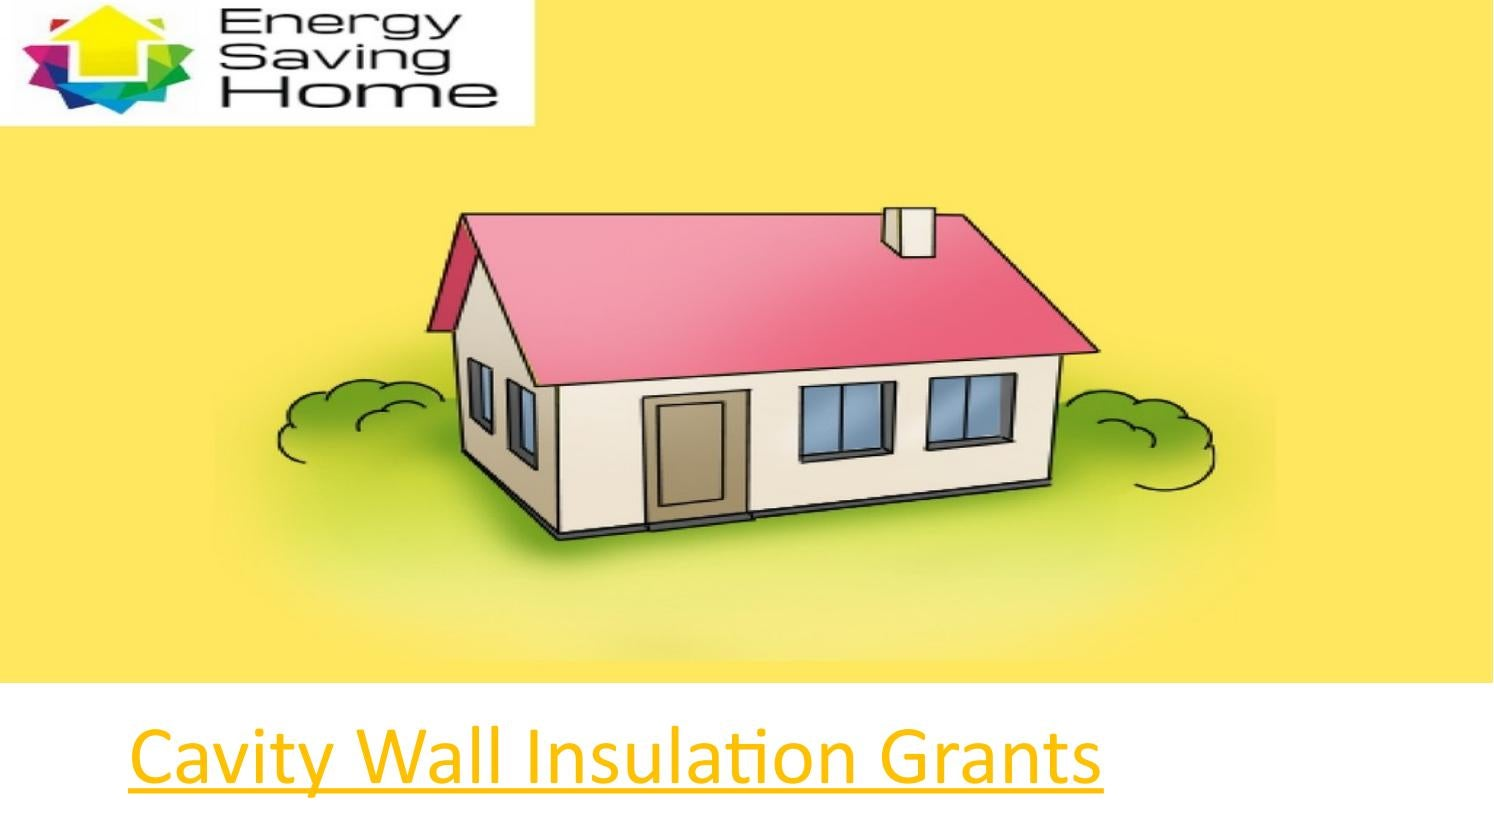 Cavity wall insulation grants by Energy Saving Home - issuu